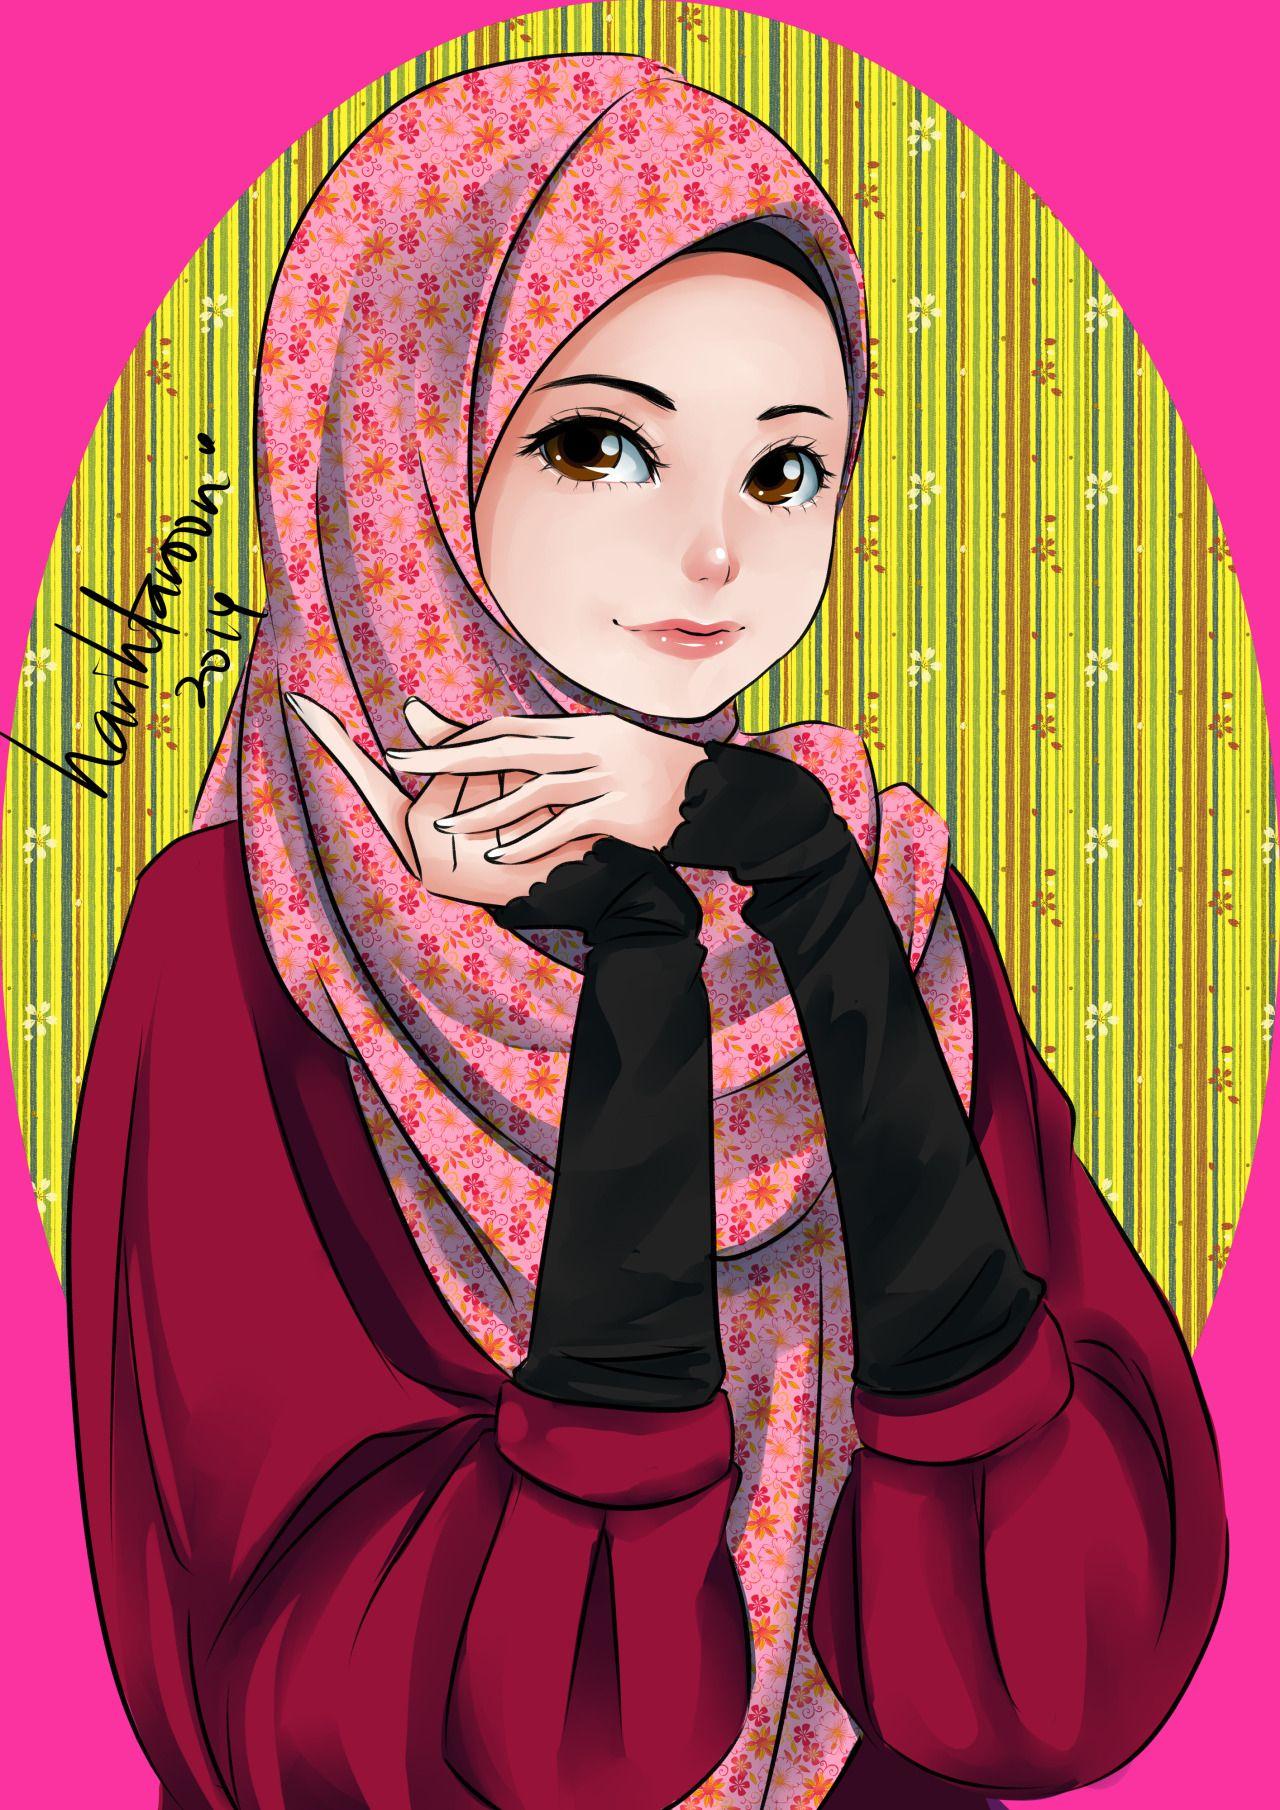 Ana Muslim fan art… tool Paint tool sai ana muslim has a